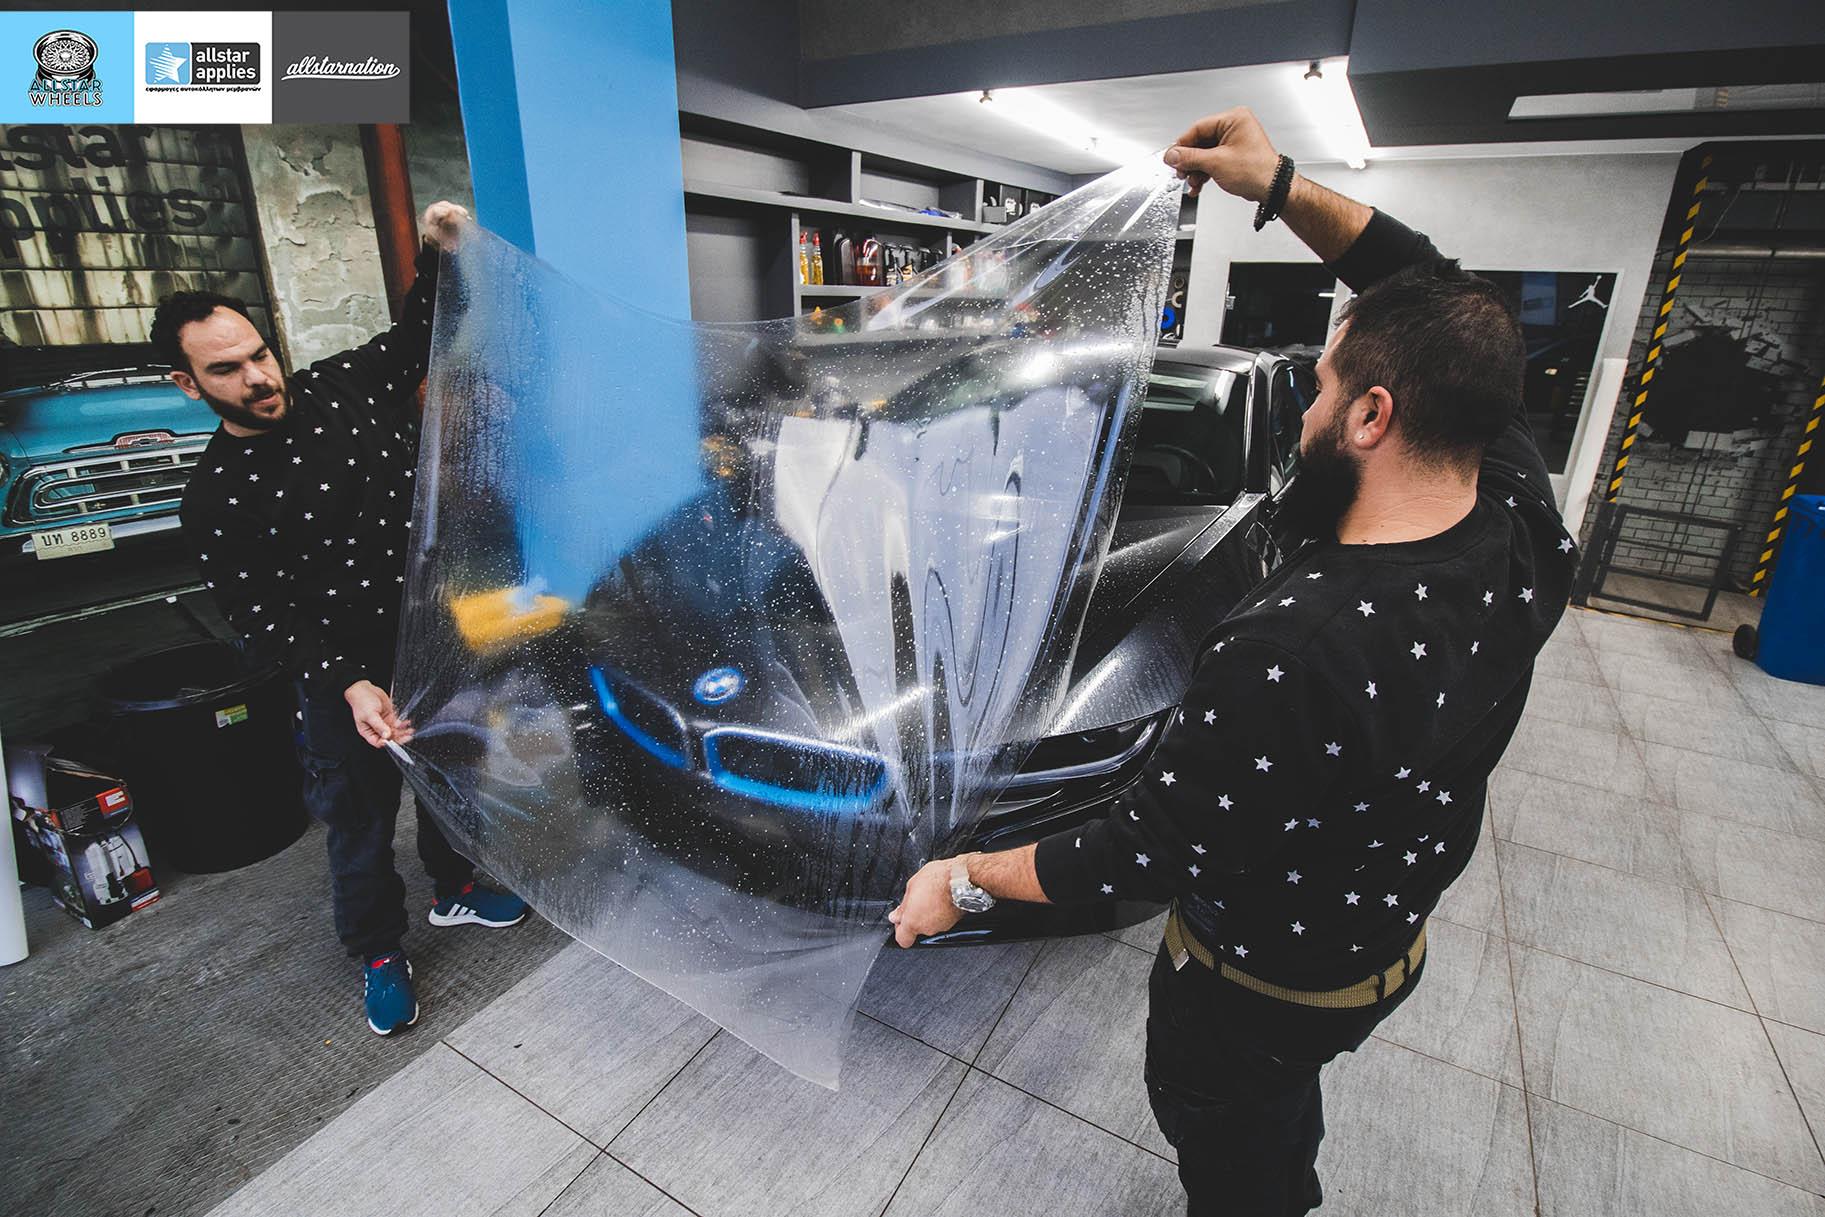 BMW I8 – Μεμβράνες προστασίας χρώματος – Μπροστινό πακέτο (13)